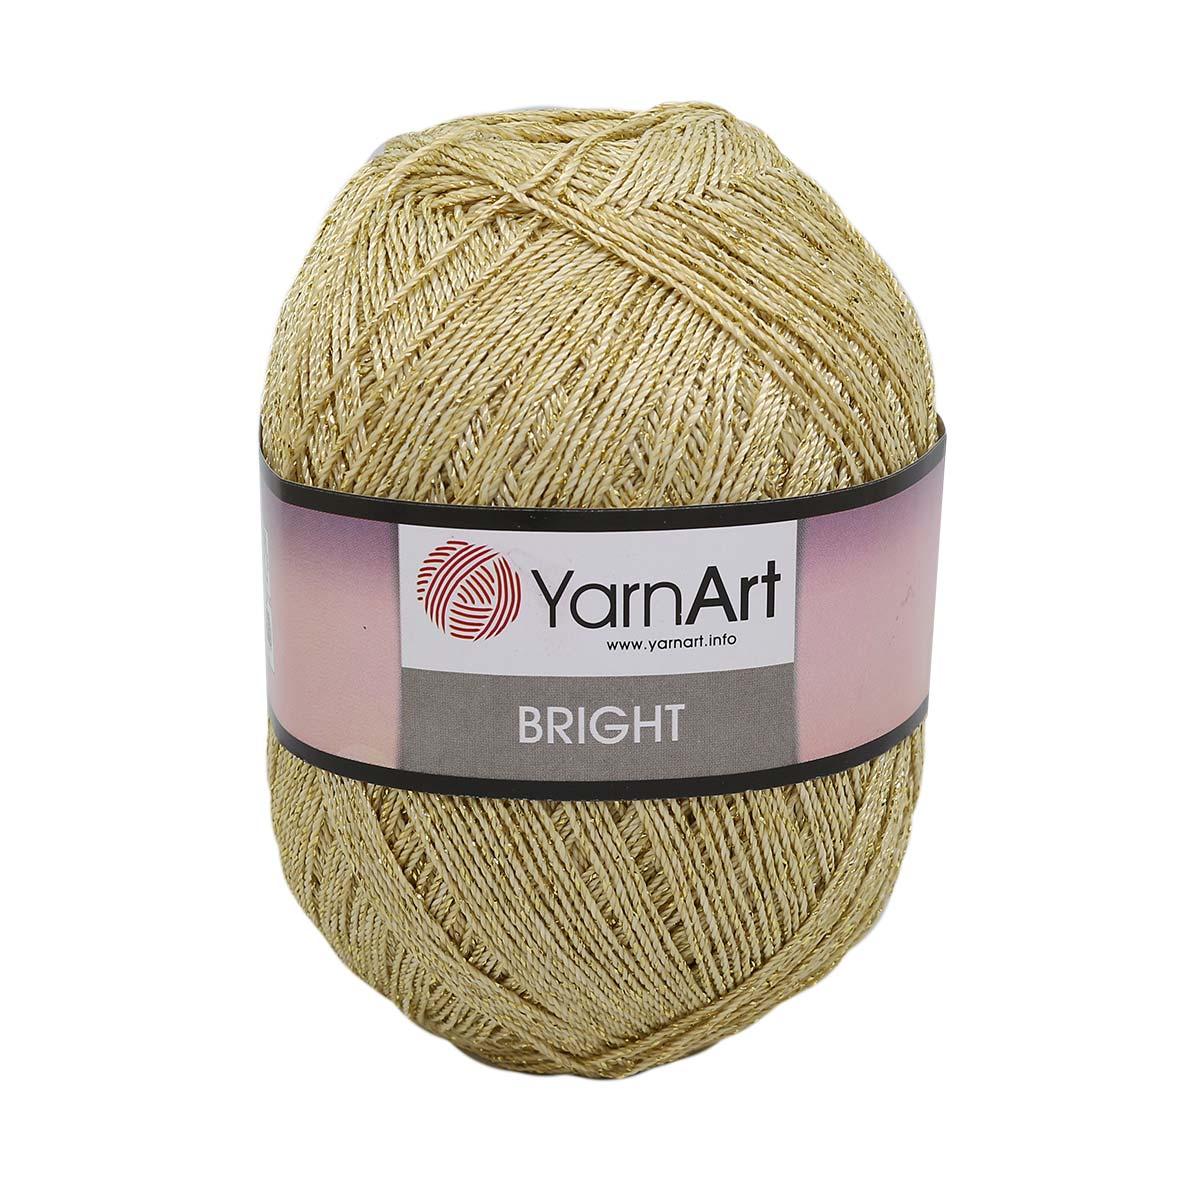 Пряжа YarnArt 'Bright' 90гр. 340м. (80%полиамид, 20%метанит п/э)ТУ